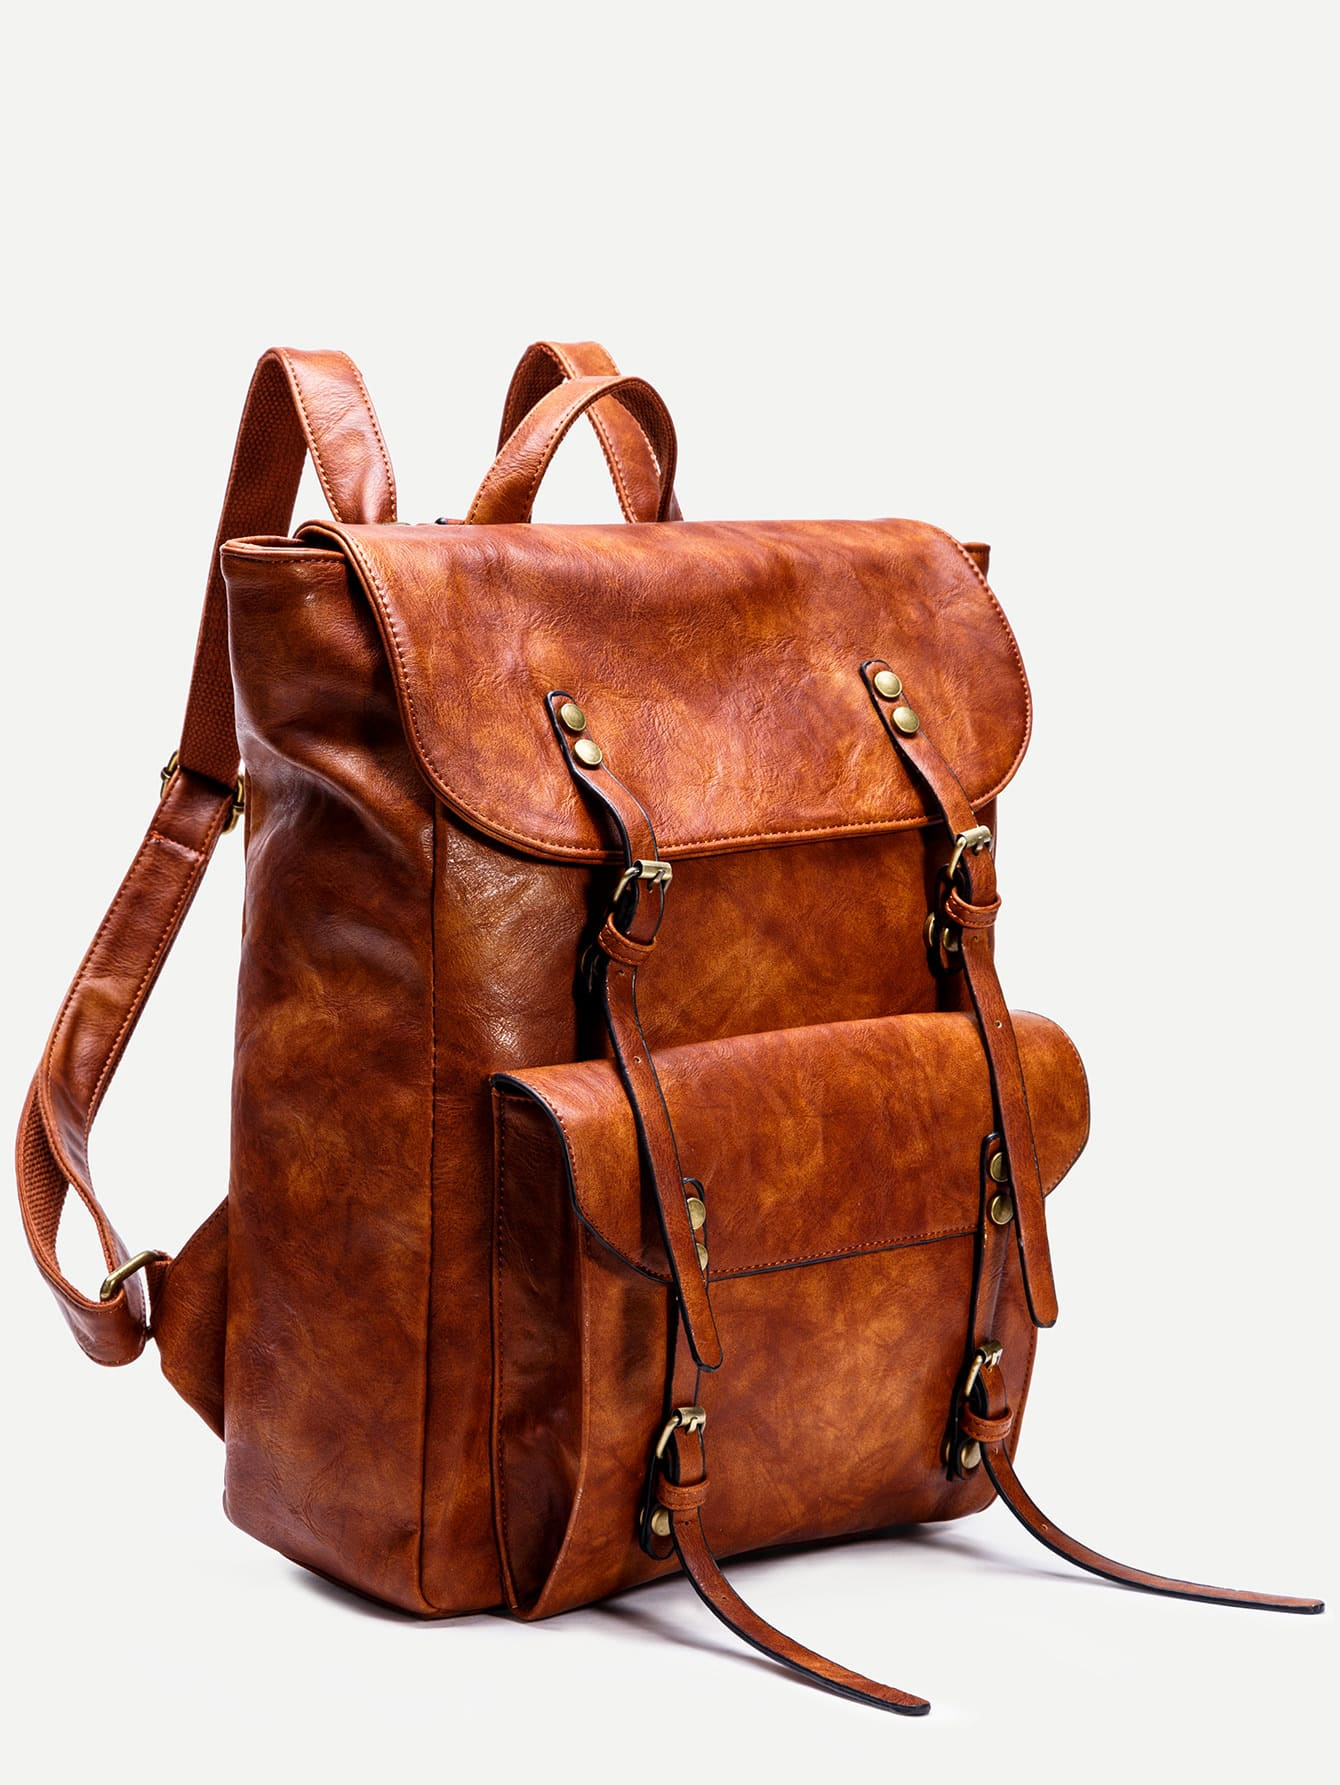 bag160905918_2